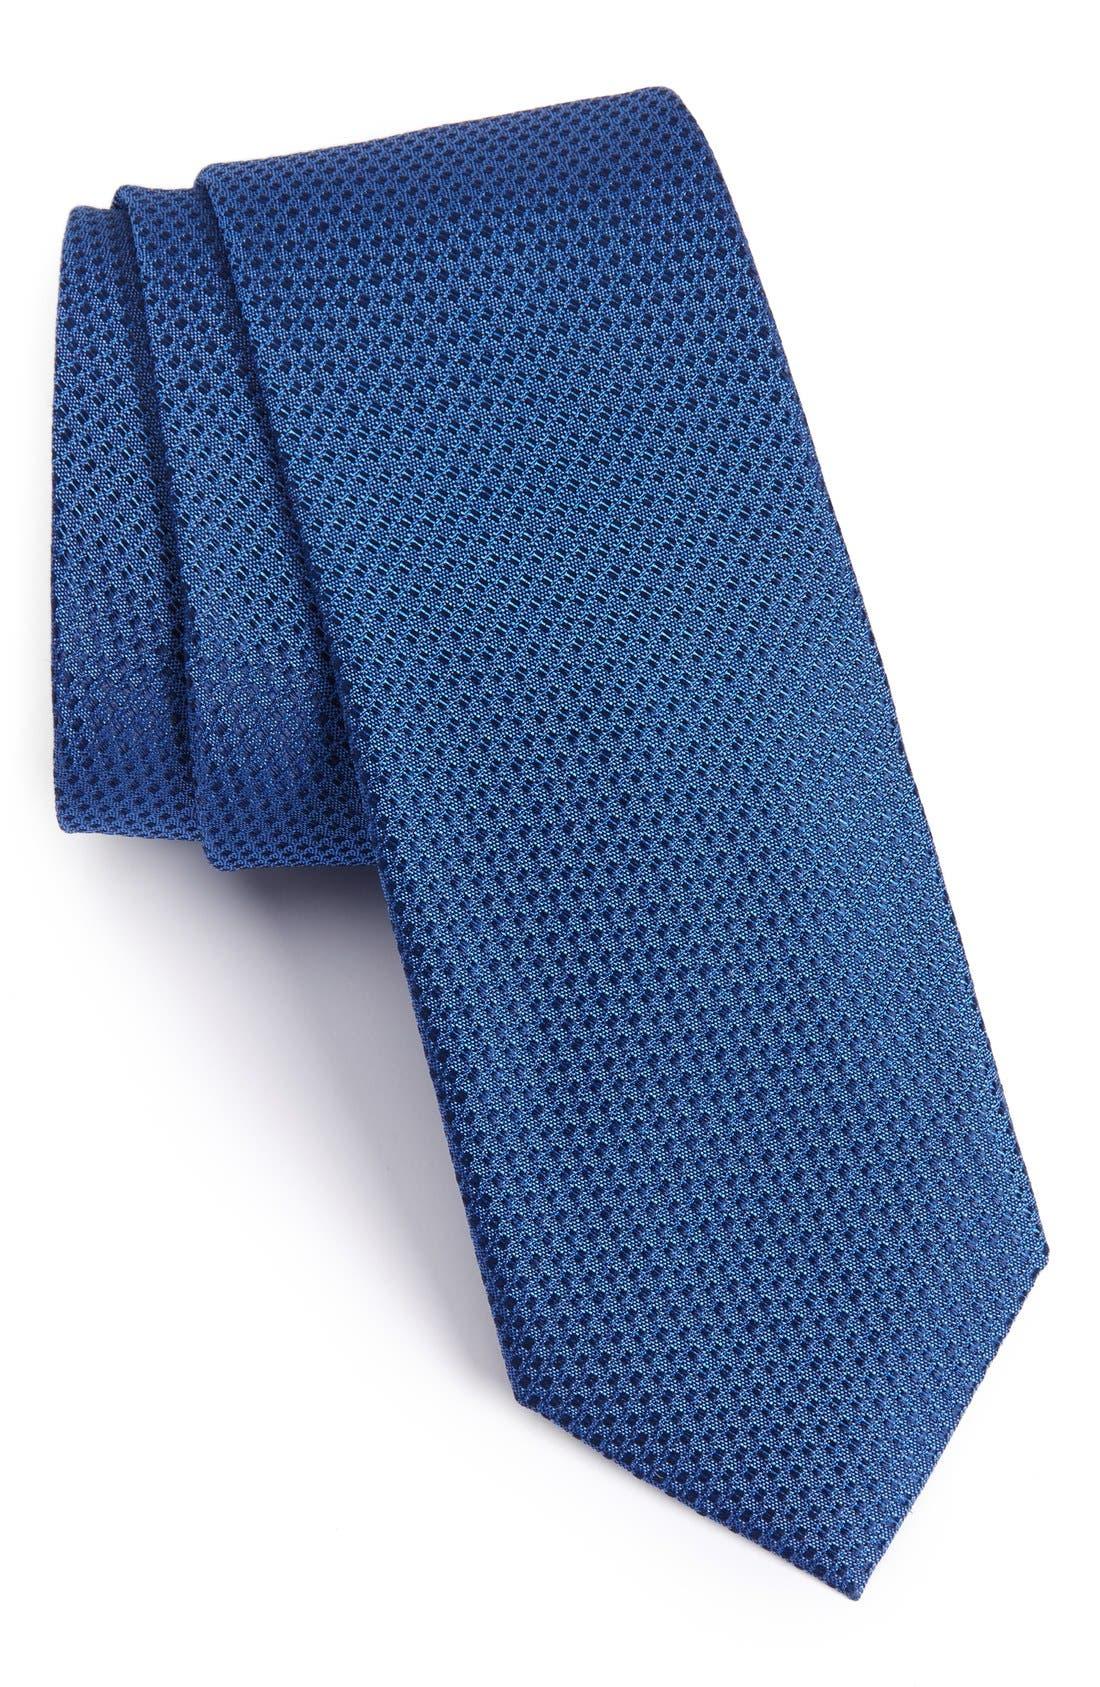 Seattle Textured Silk Tie,                             Main thumbnail 30, color,